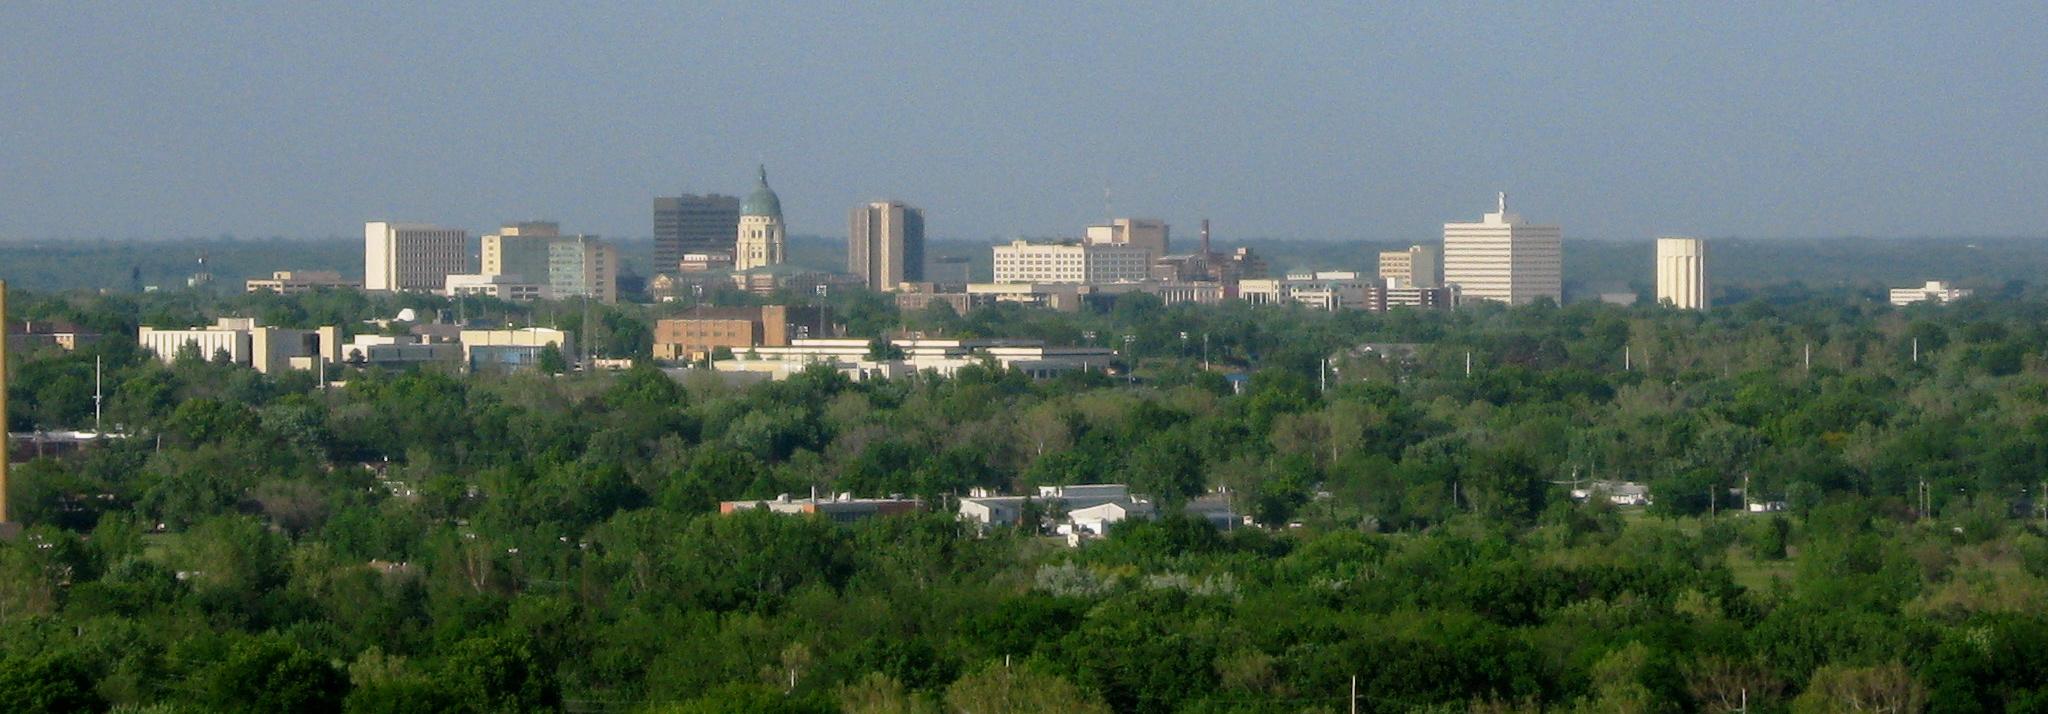 List Of Cities In Kansas Familypedia Fandom Powered By Wikia